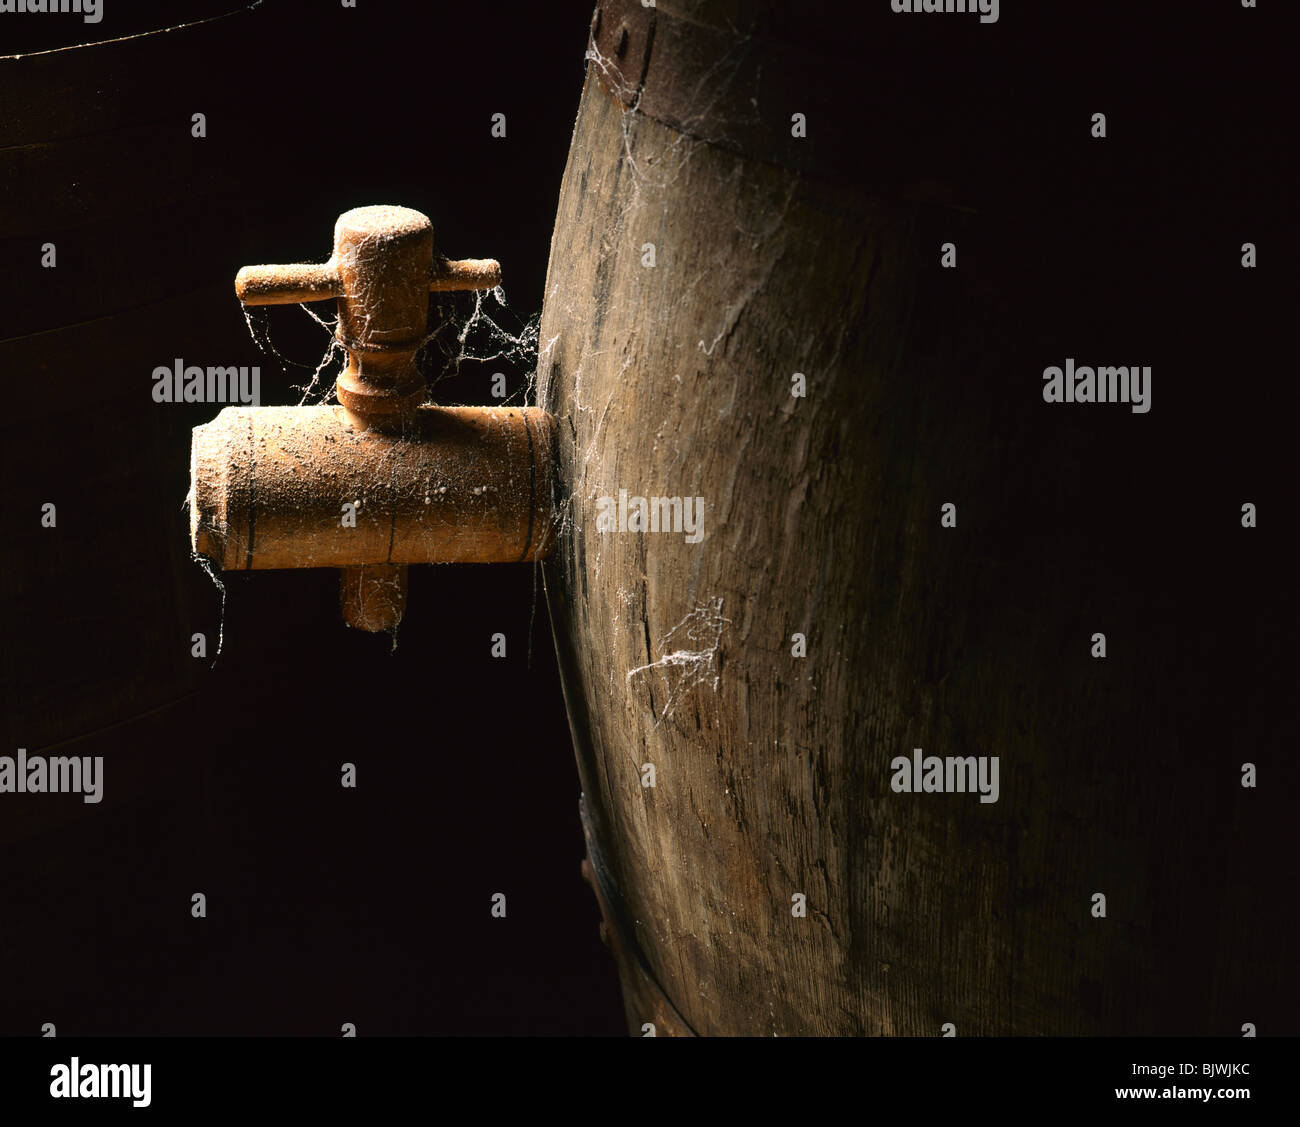 Wooden Barrel Close up - Stock Image